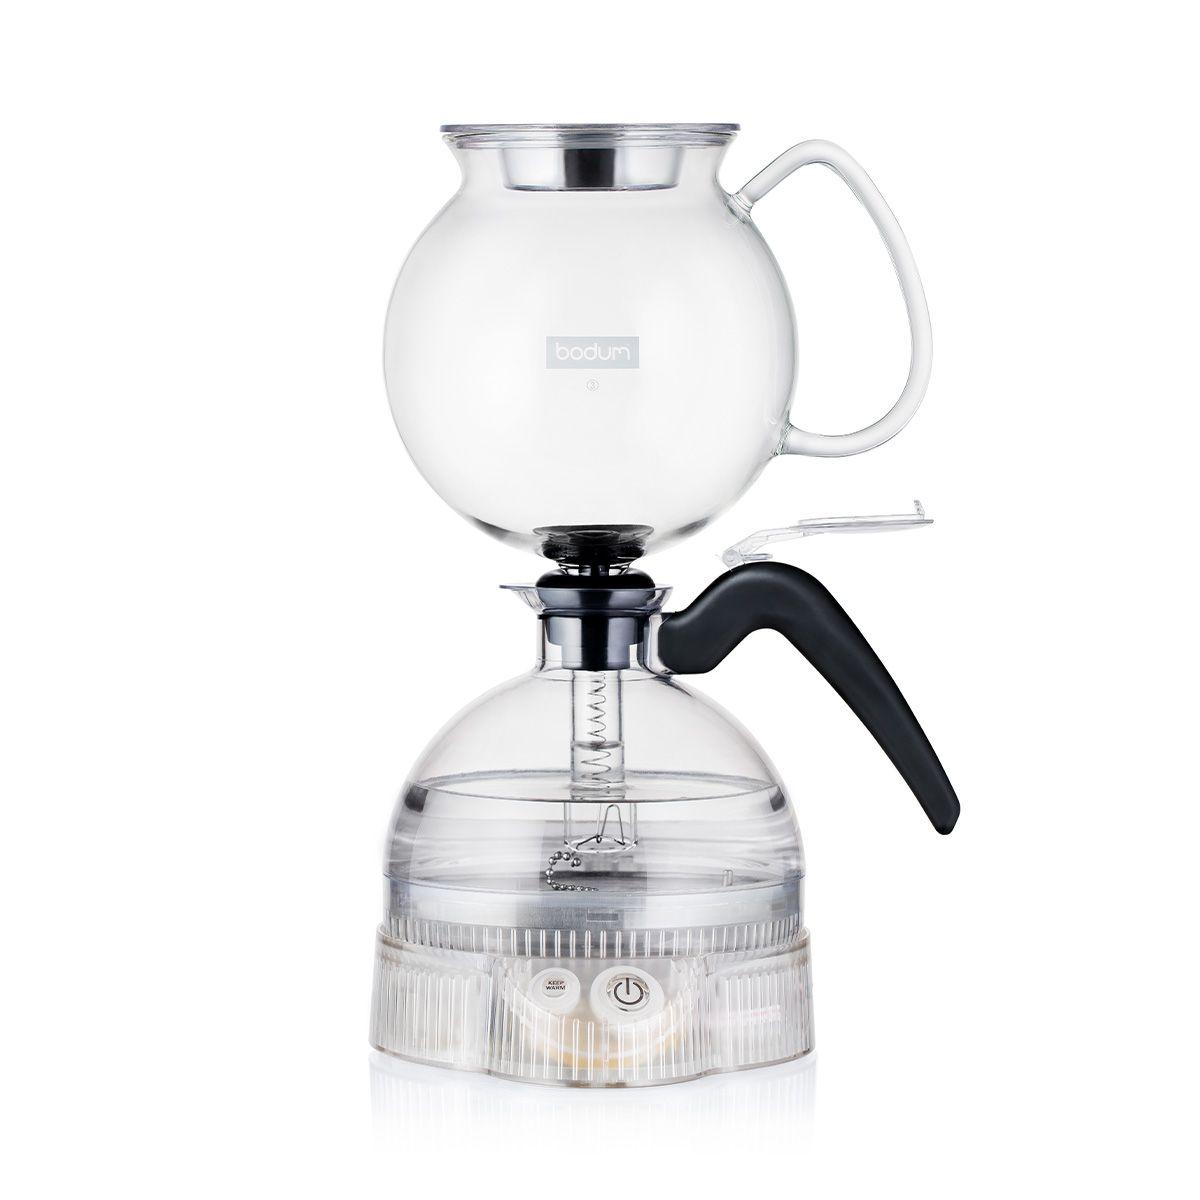 Siphon Coffee Maker ePEBO 1.0 L